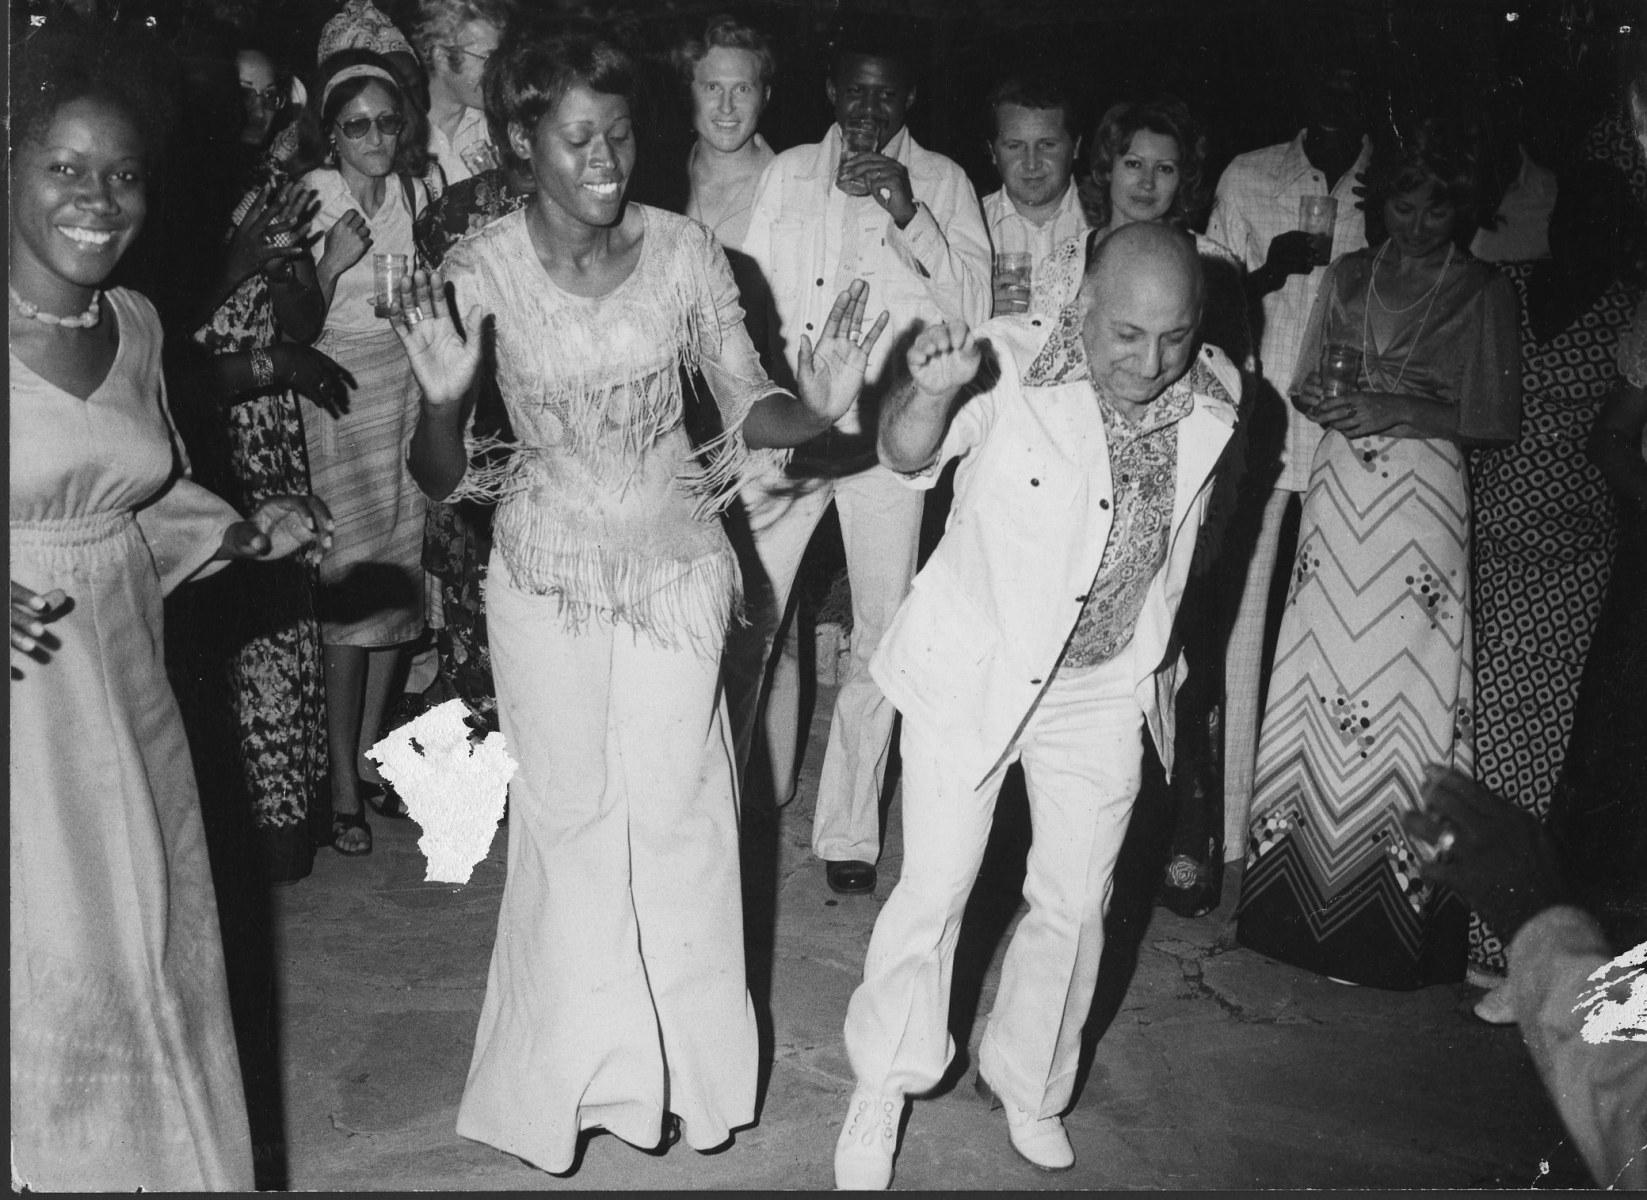 9-Leo-dancing-in-Bamako-Mali-1960s